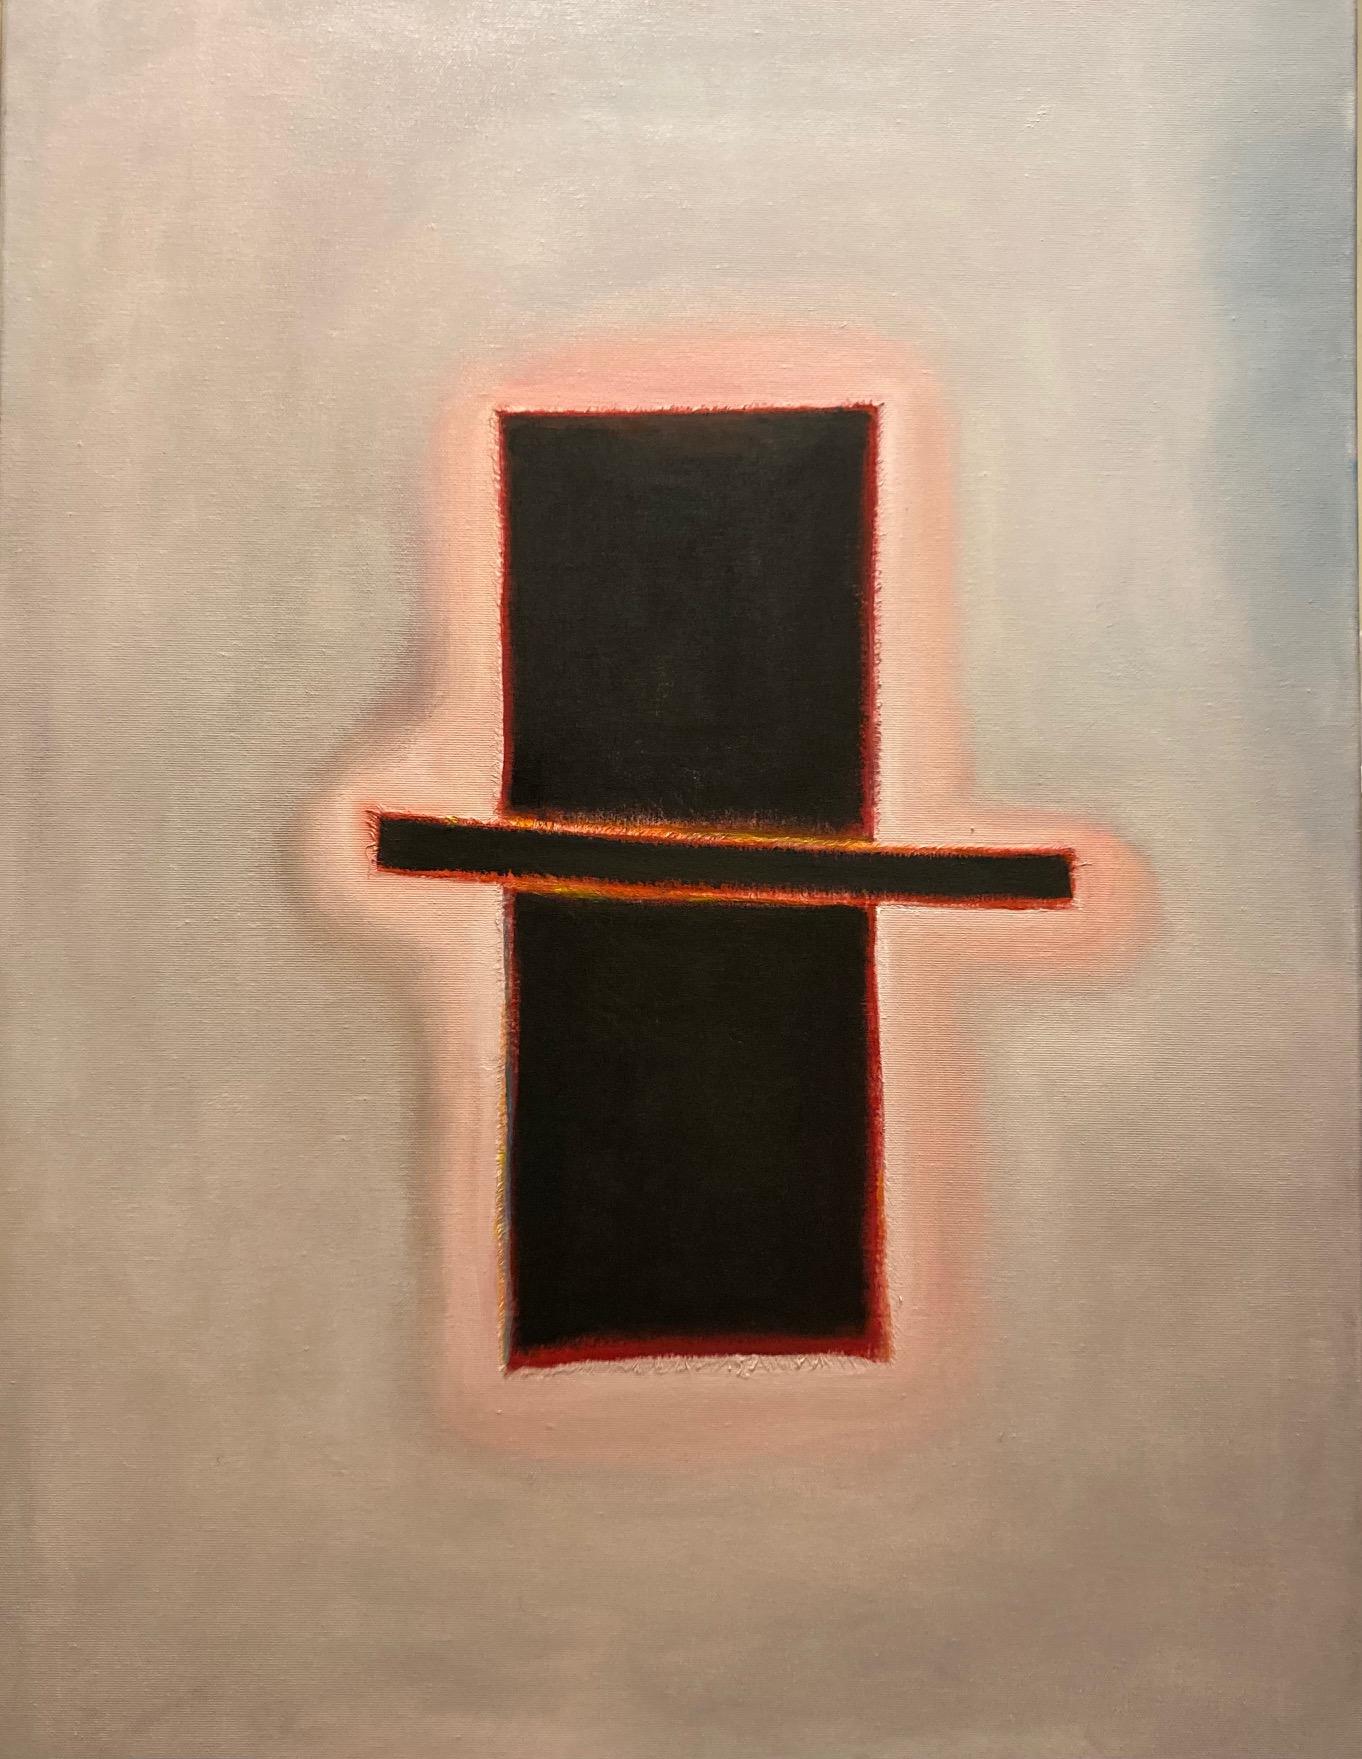 Silent Sign (8), Öl auf Leinwand, 80 x 60 cm, 2020